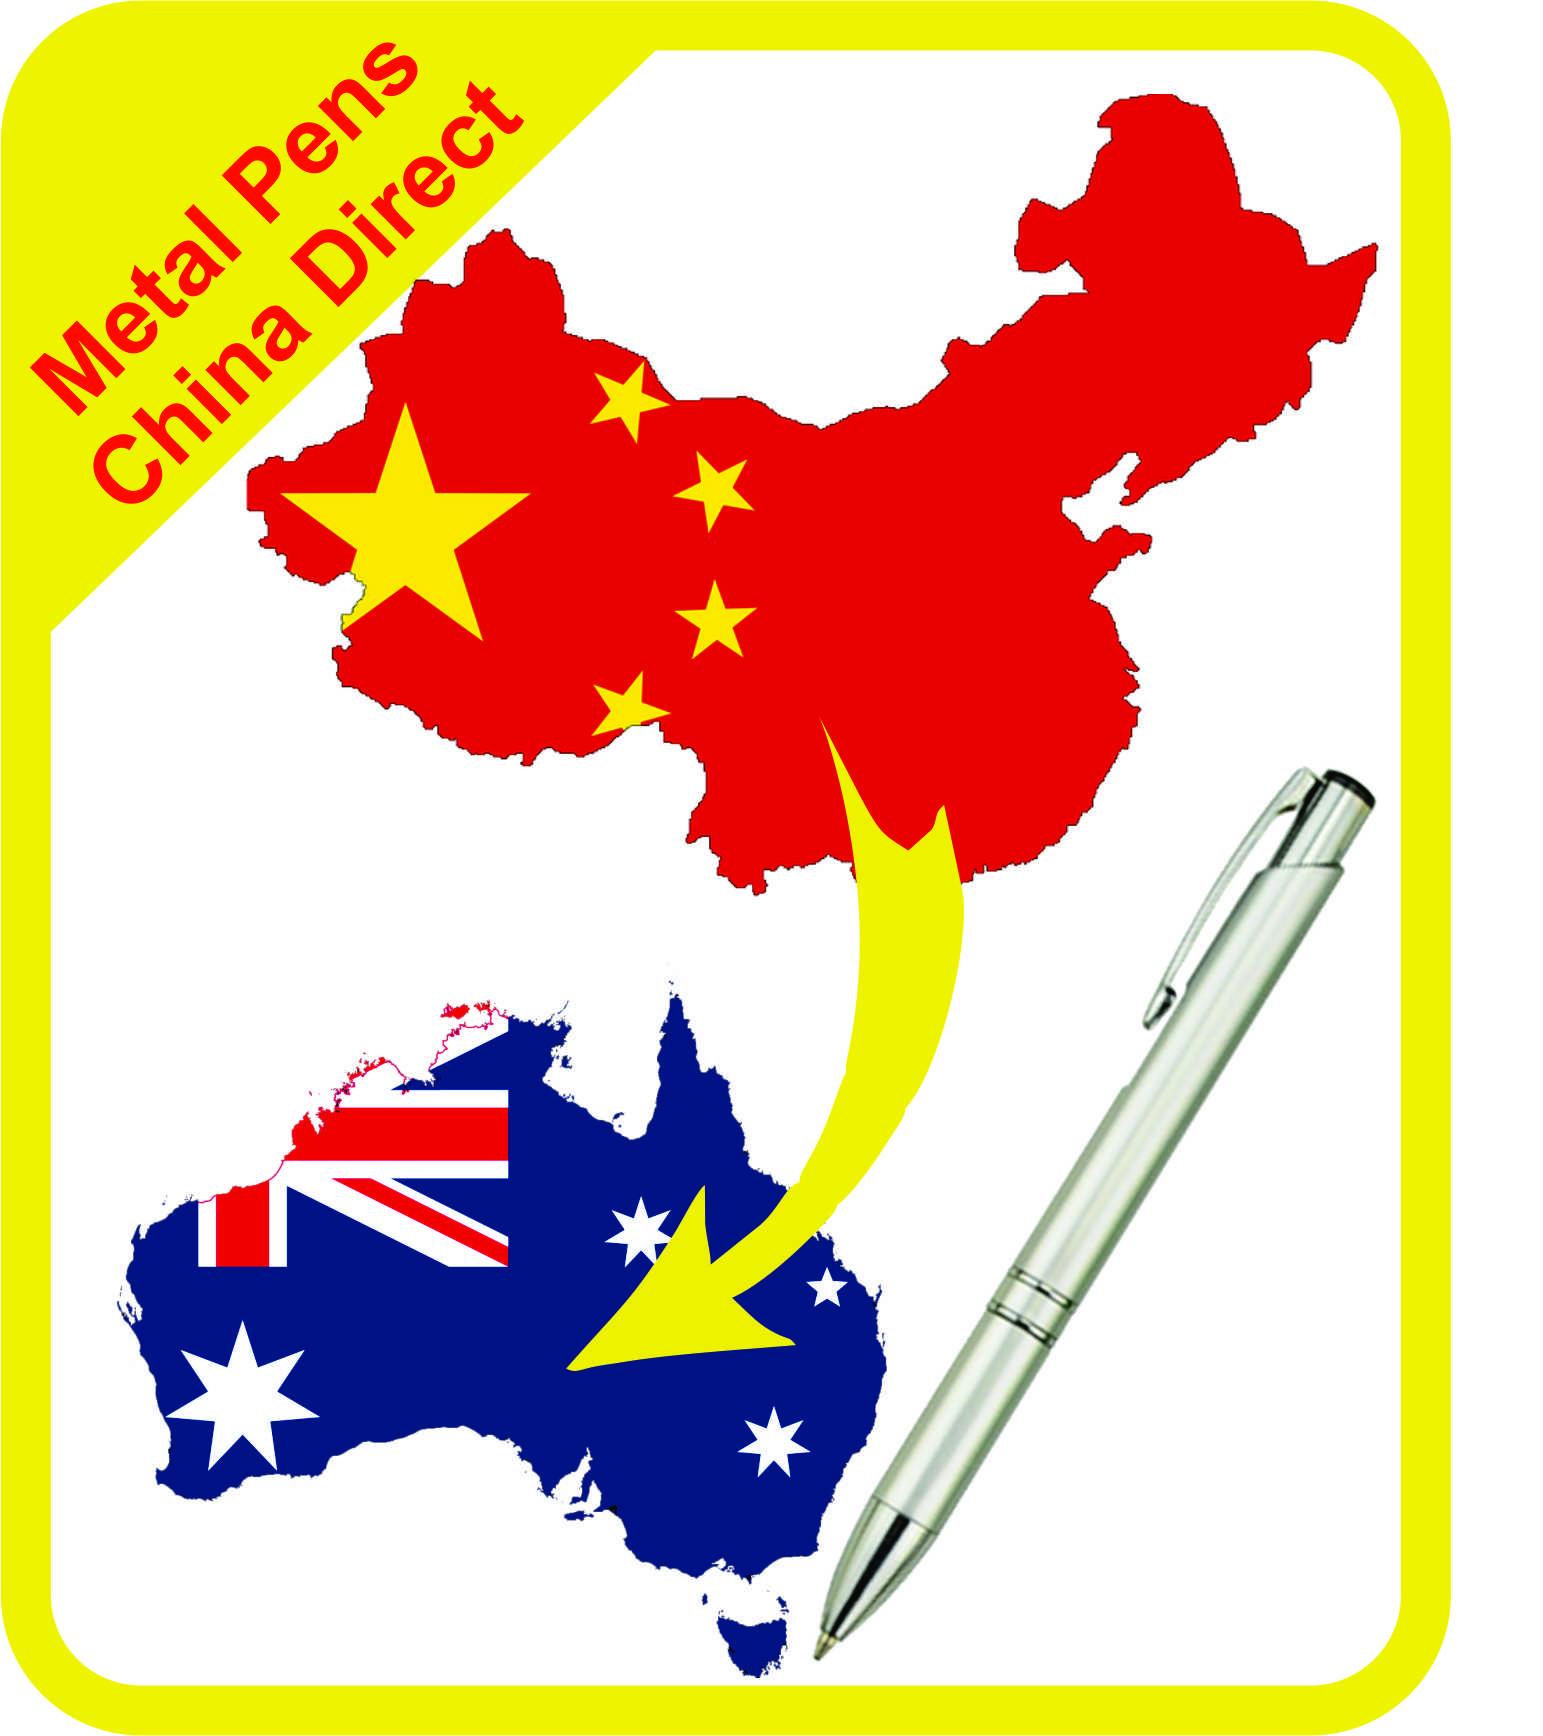 Metal Pens China Direct